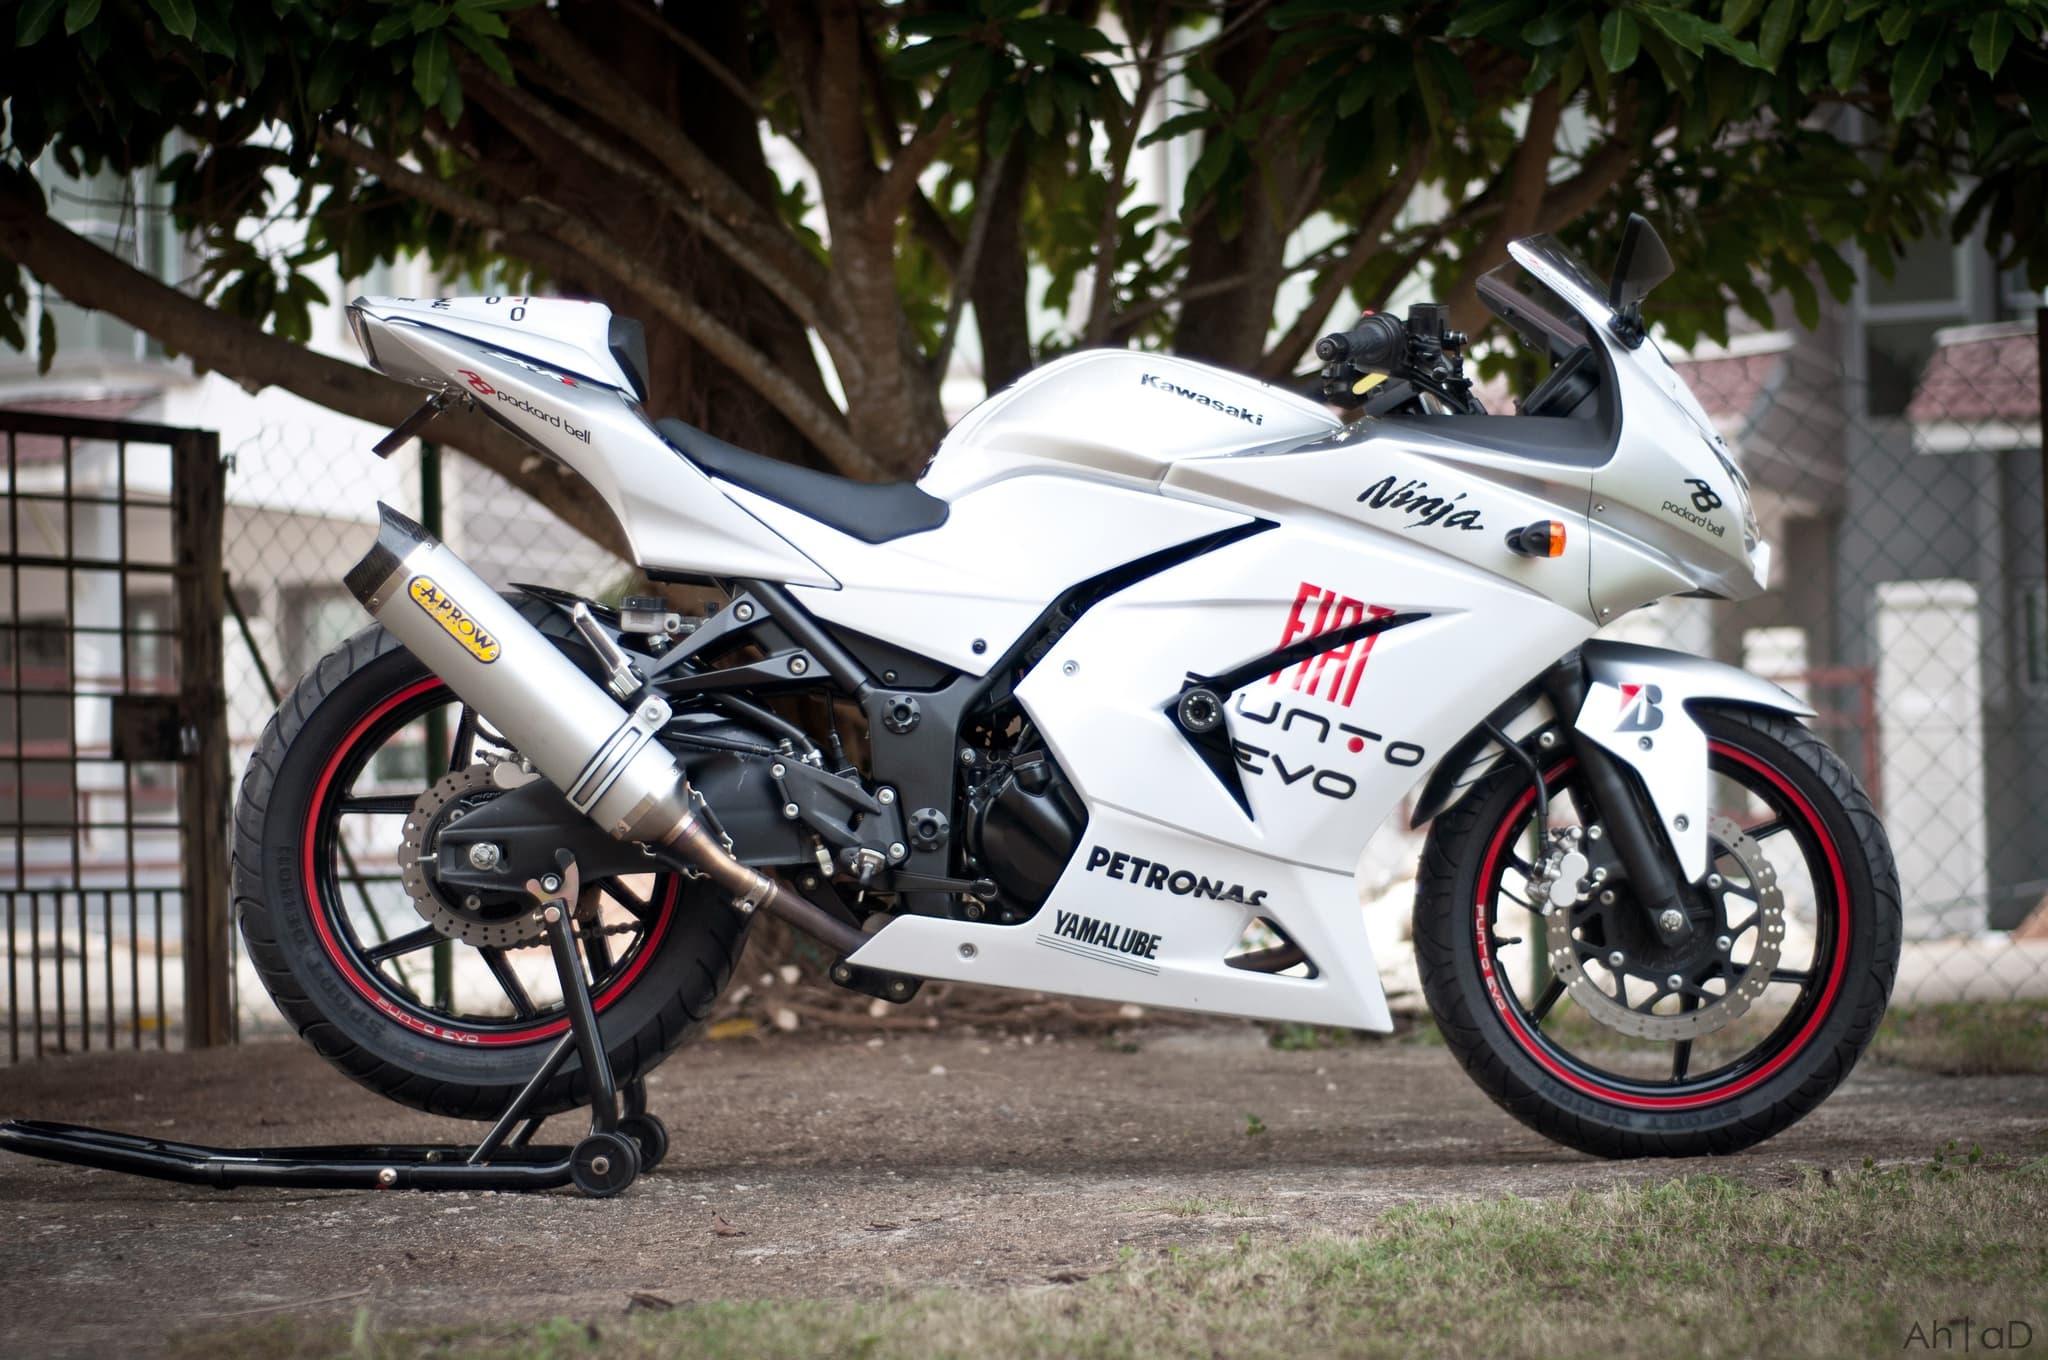 Kawasaki Ninja 250r Wallpapers Images And Pictures High Quality